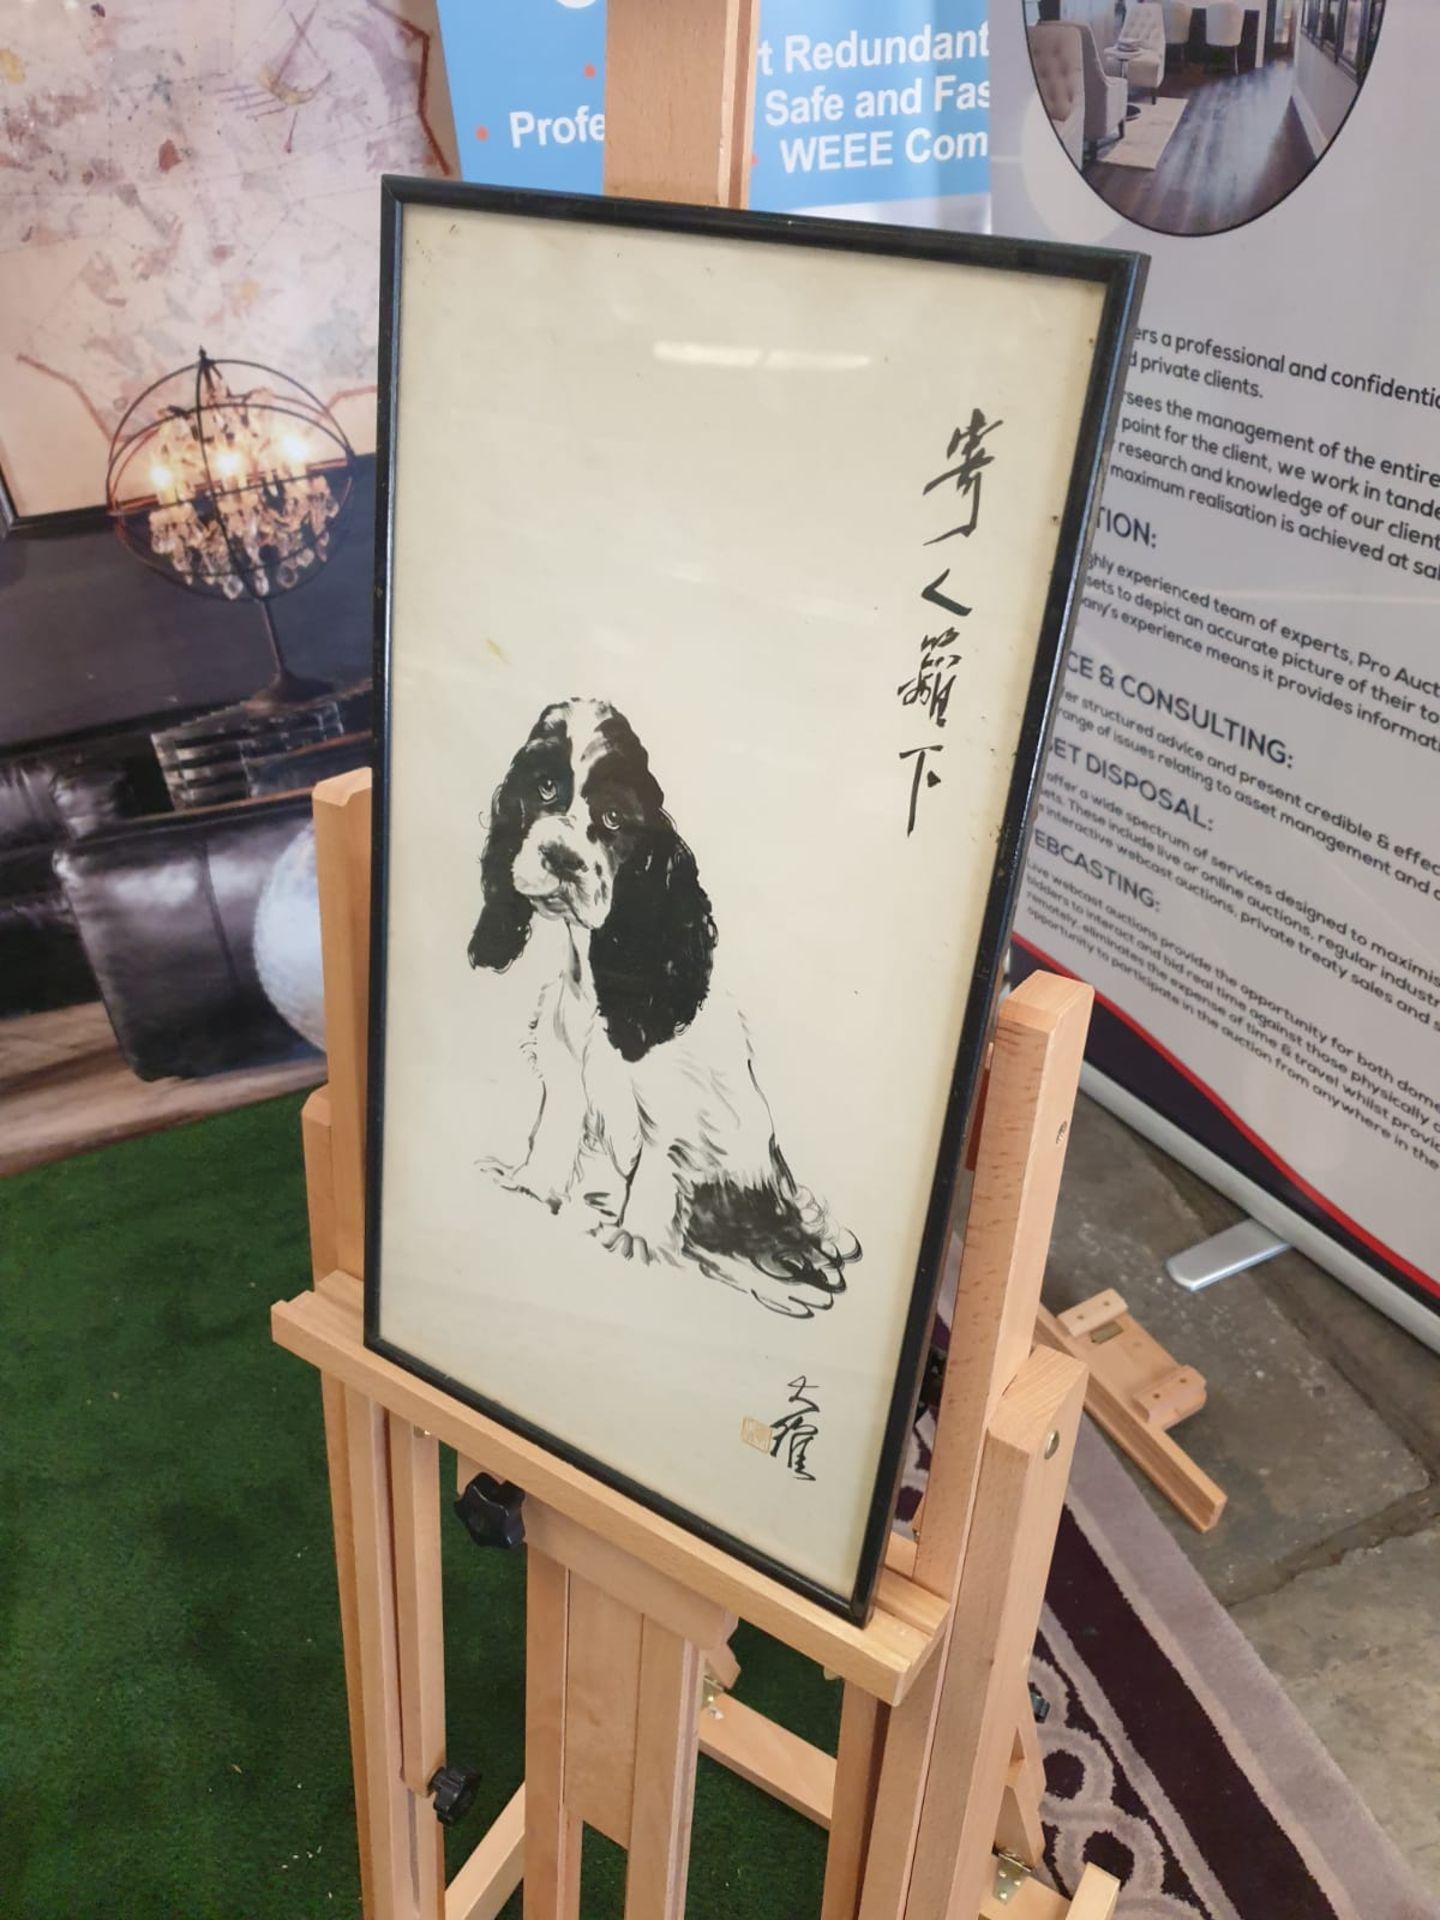 David Kwo Da-Wei (1919-2003) Chinese Lithographic Print Spaniel Da Wei Kwo, David Kwo 1919-2003 ( - Image 2 of 4